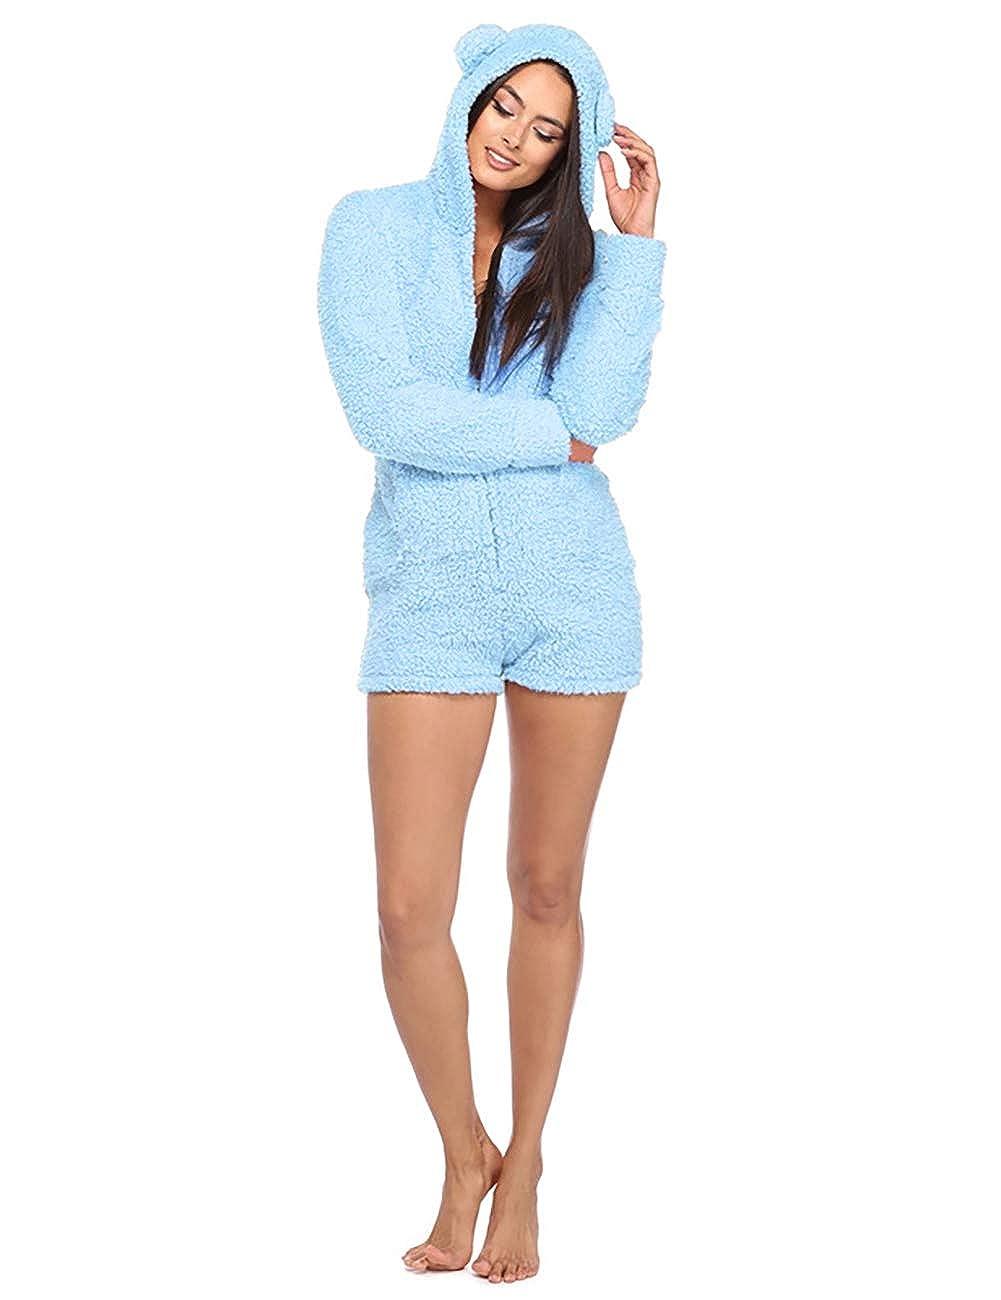 719edf1c0853 Amazon.com  Amiliashp Womens Cute Sherpa Romper Fleece Onesie Pajama One  Piece Zipper Short Hooded Jumpsuit Sleepwear Playsuit (Blue